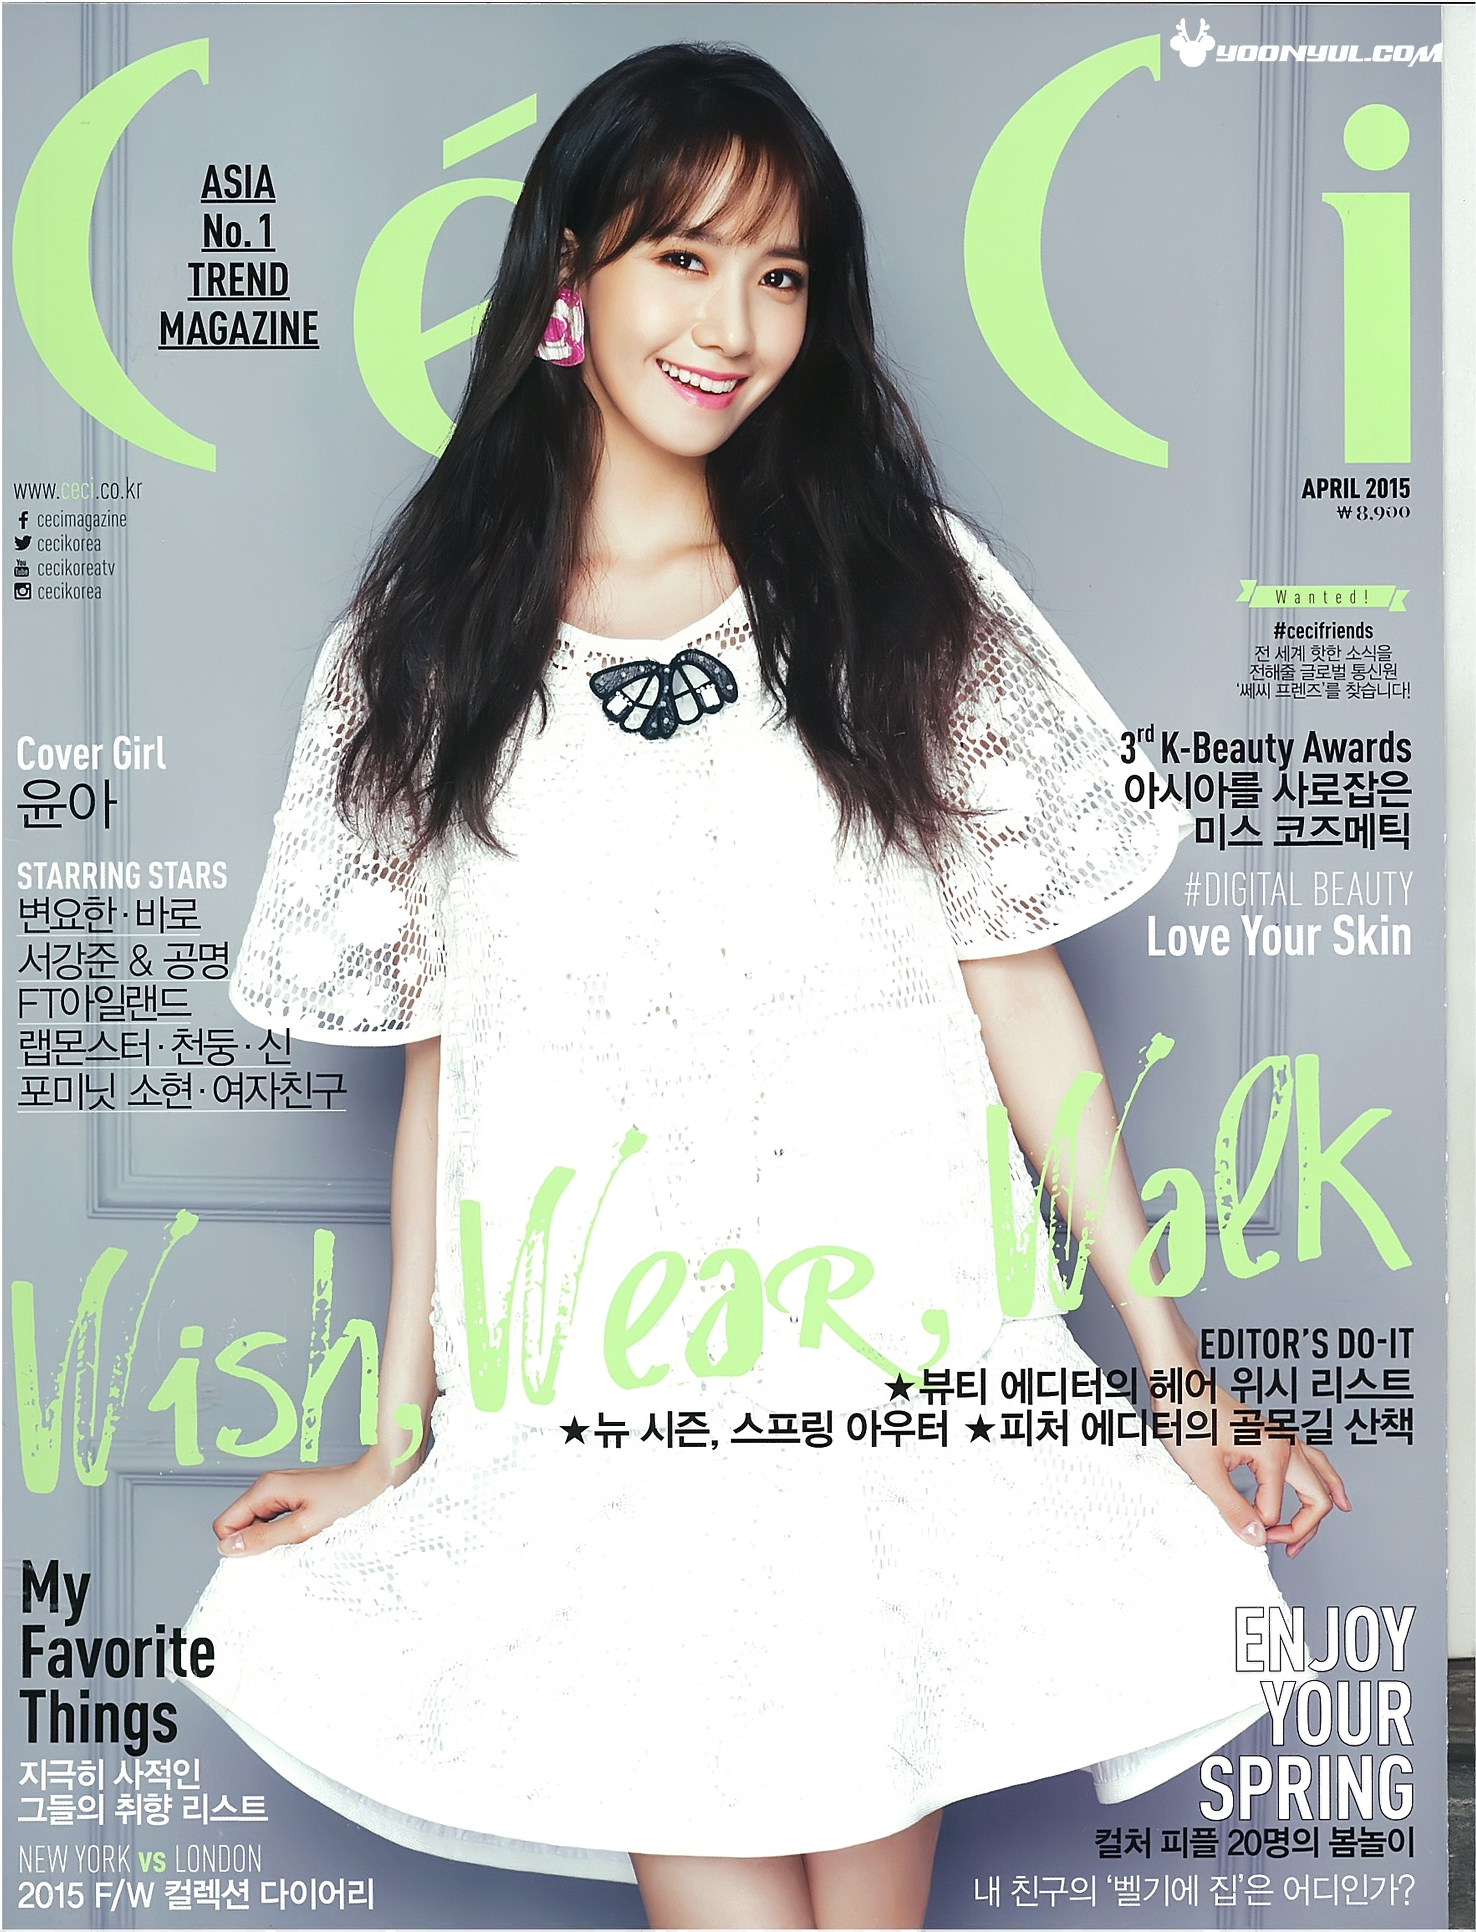 im Yoona Haircut View Fullsize im Yoona Image